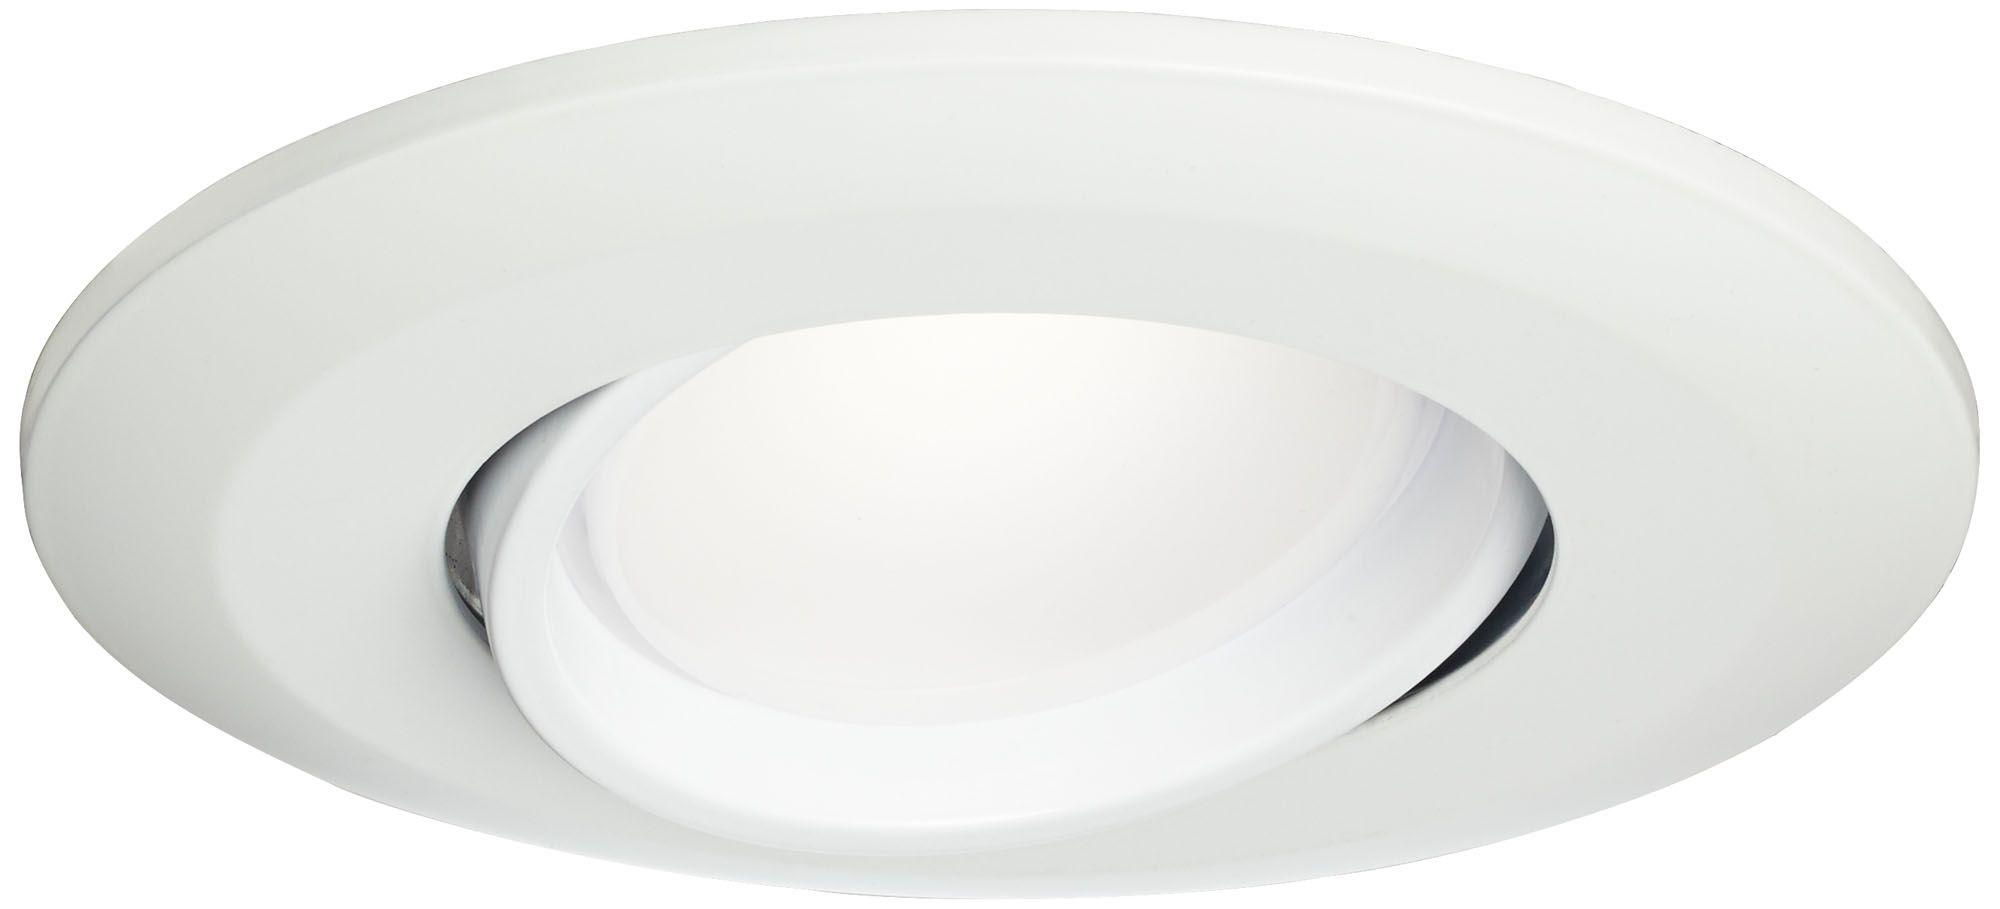 5 /6  White Gimbal Retrofit 15W LED Eyeball Downlight  sc 1 st  L&s Plus & Recessed Lighting - Kitchen Bathroom Dining and Living Room Trim ... azcodes.com